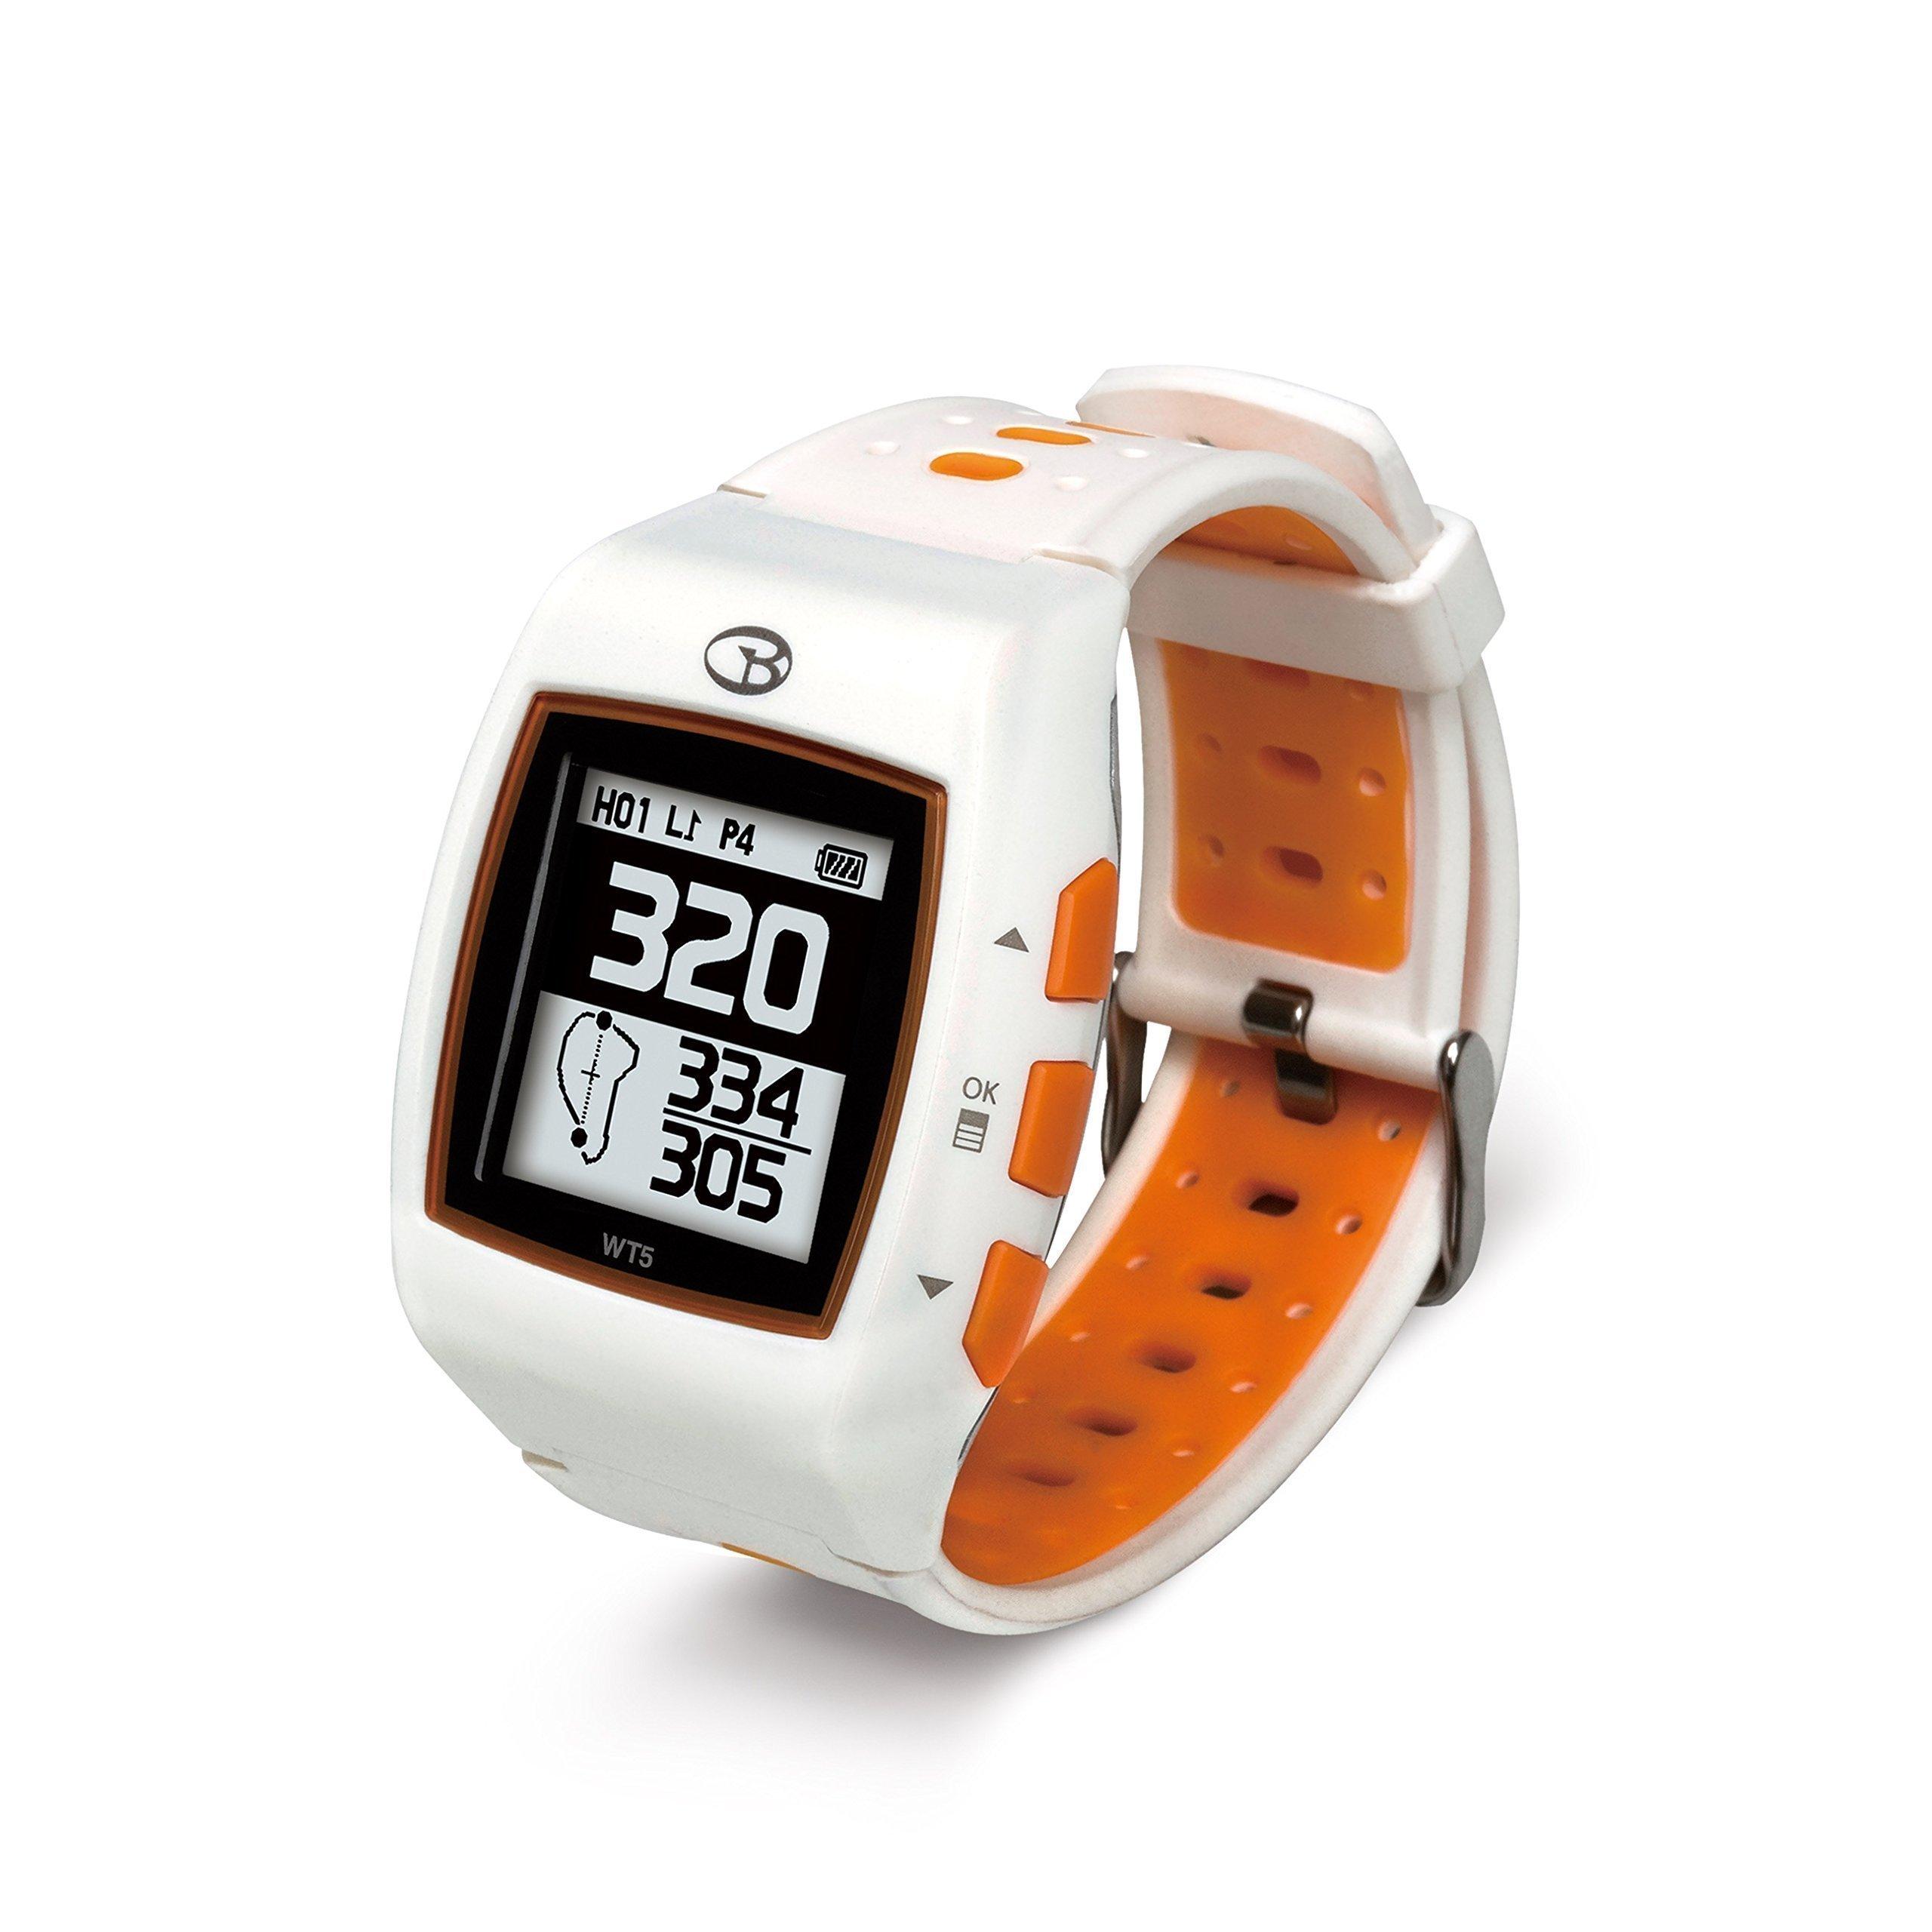 GolfBuddy WT5 Golf GPS Watch, White/Orange